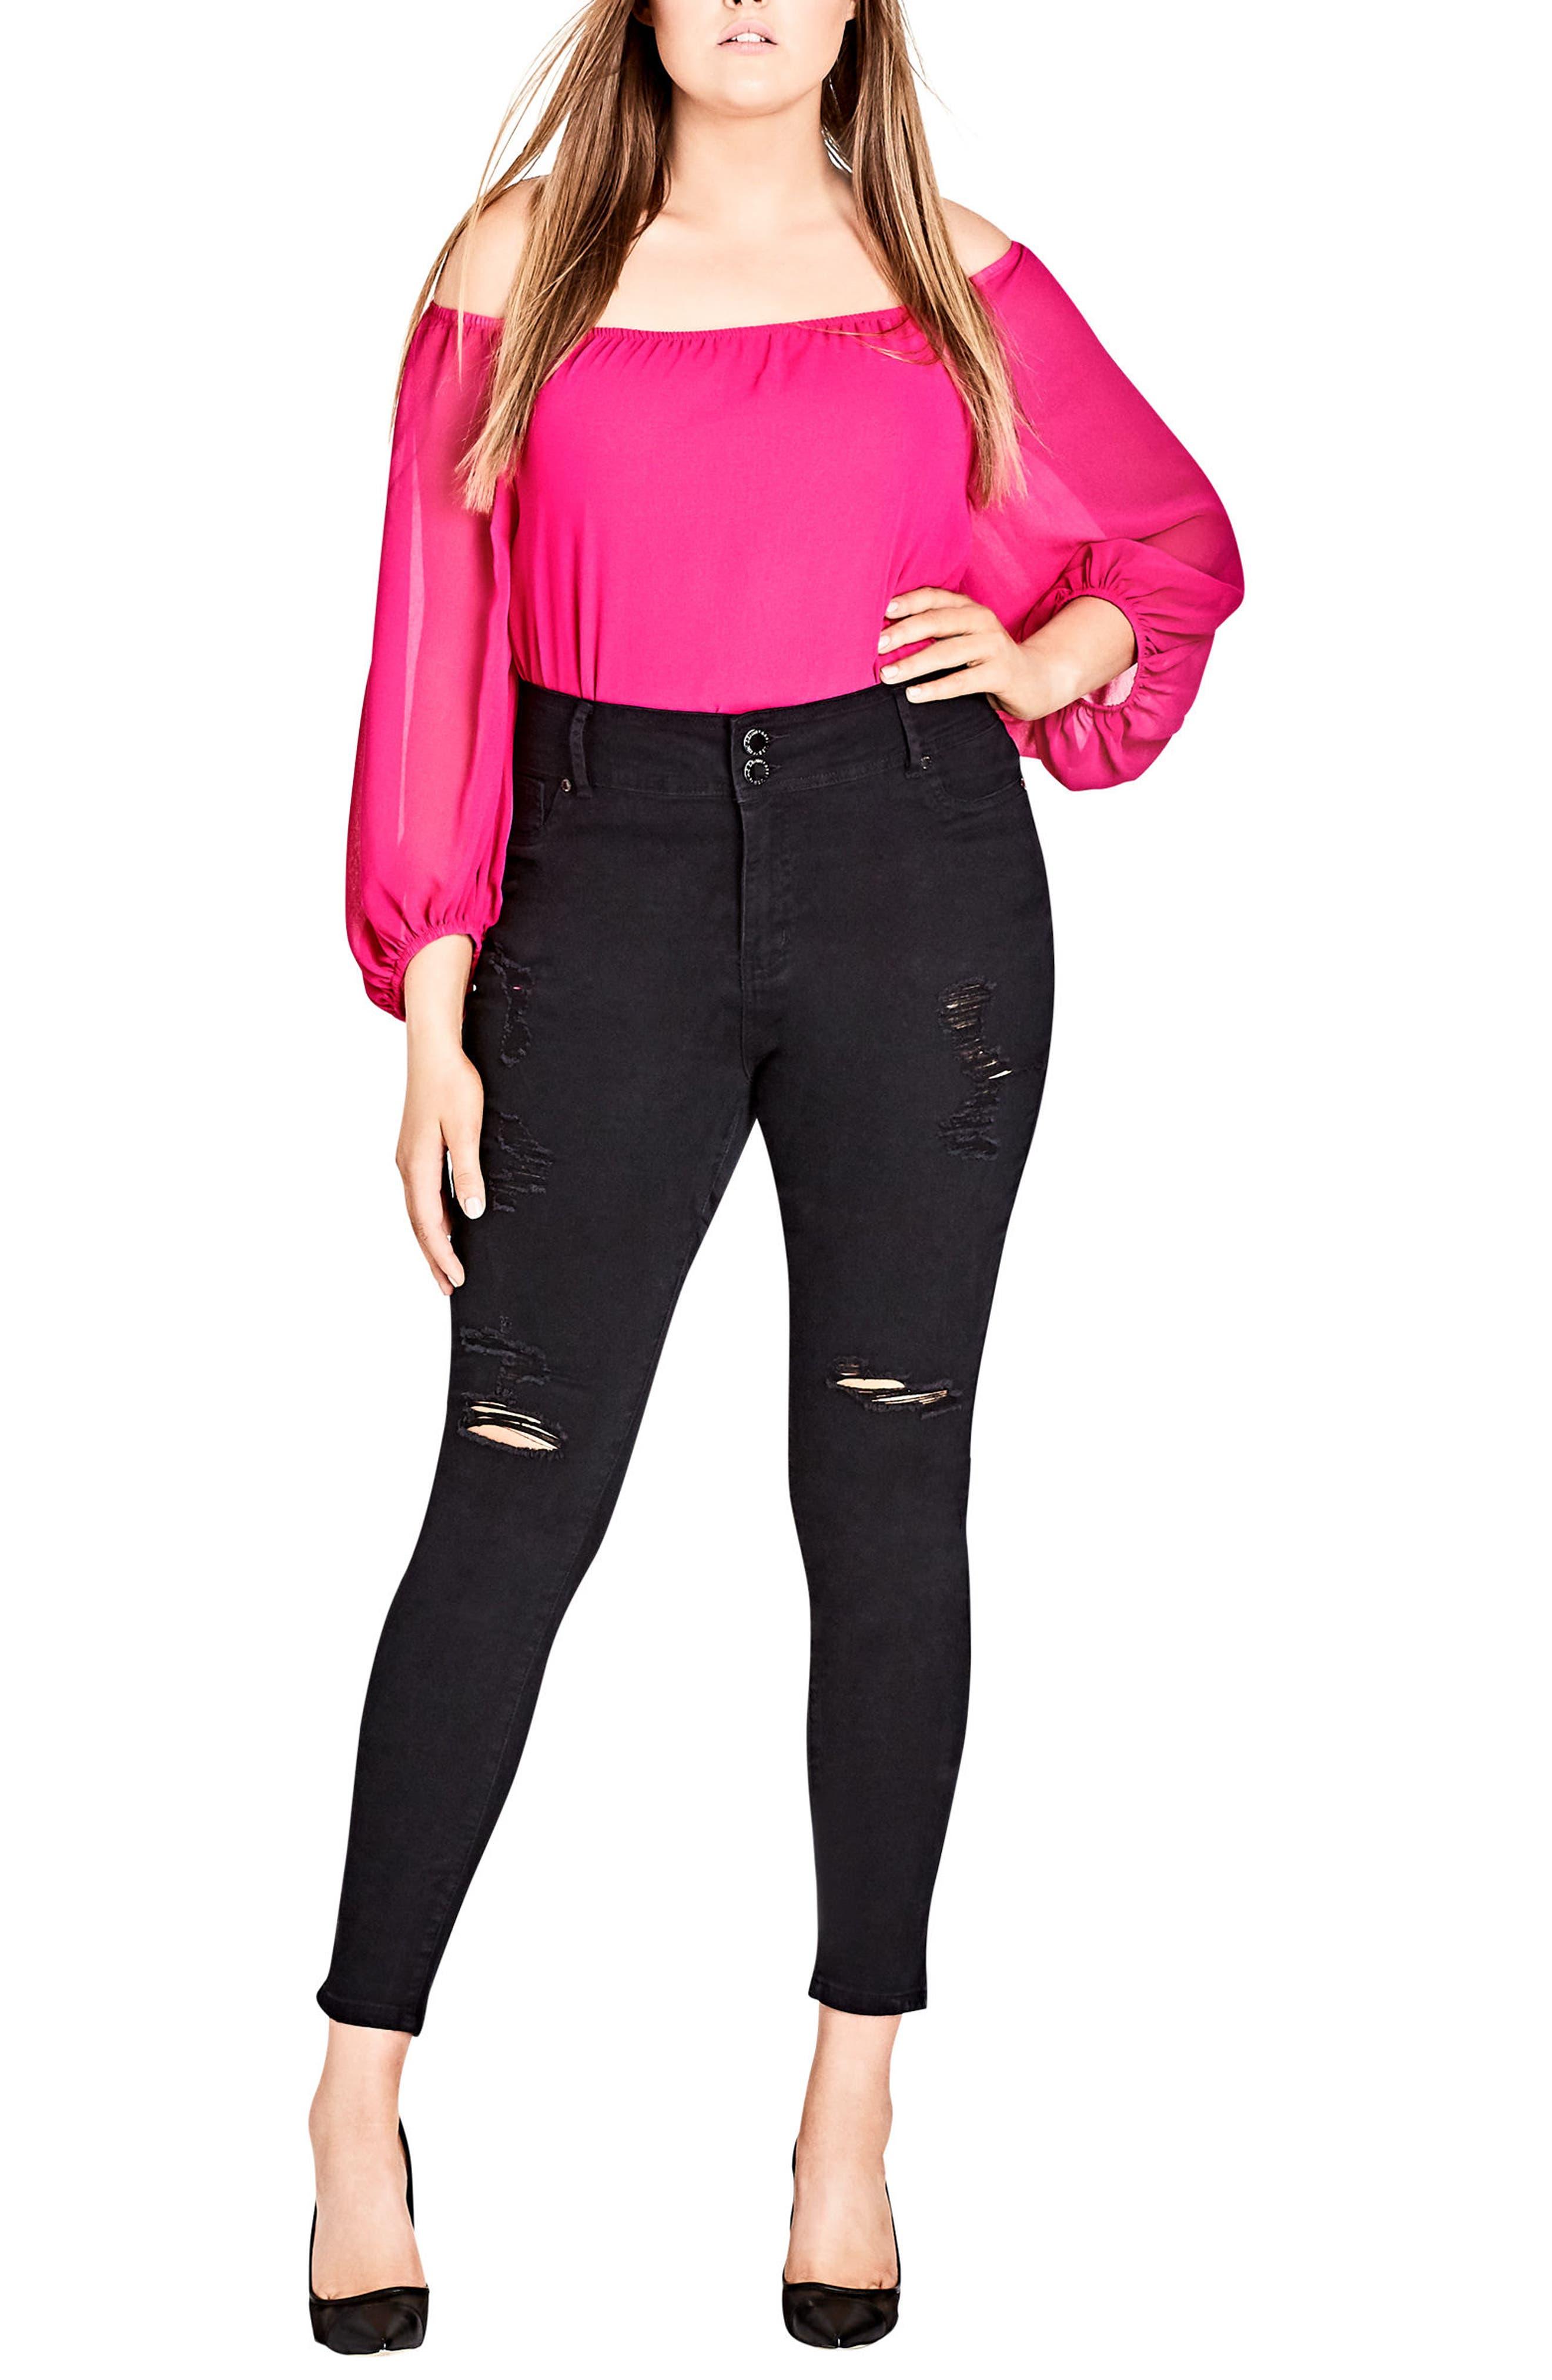 Asha Ripped Skinny Jeans,                             Alternate thumbnail 4, color,                             001